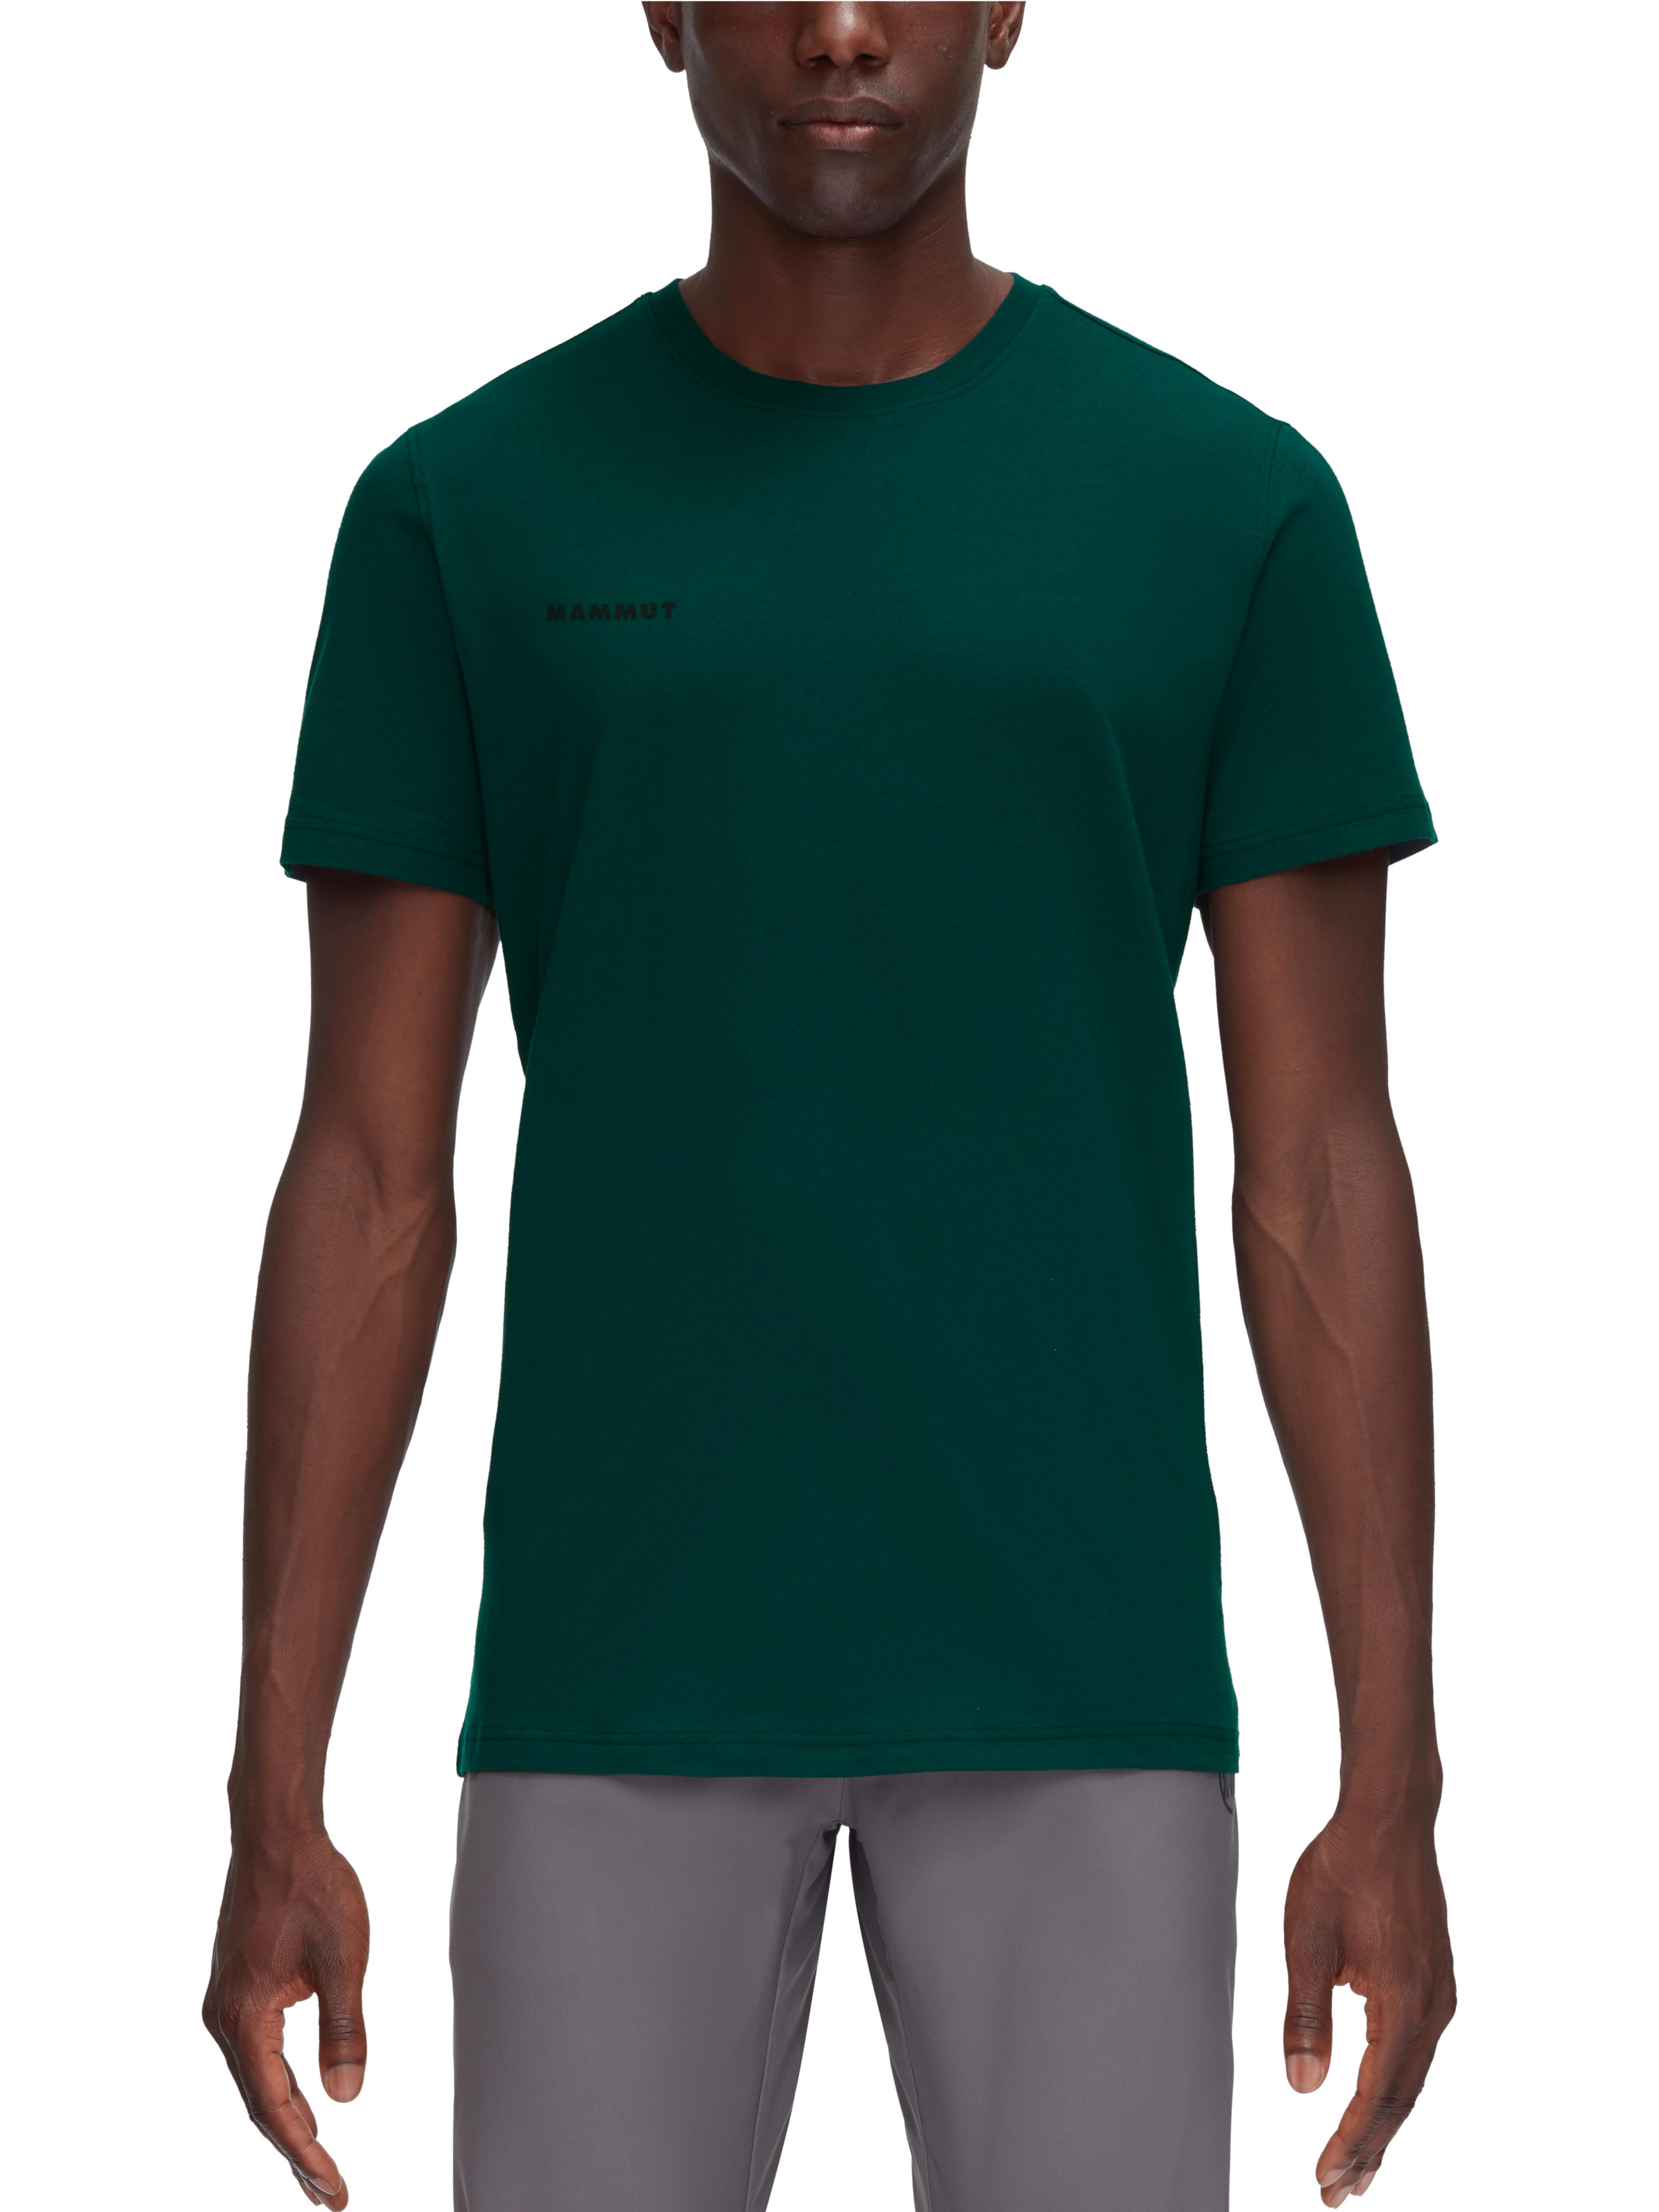 Mammut Logo T-Shirt Men product image